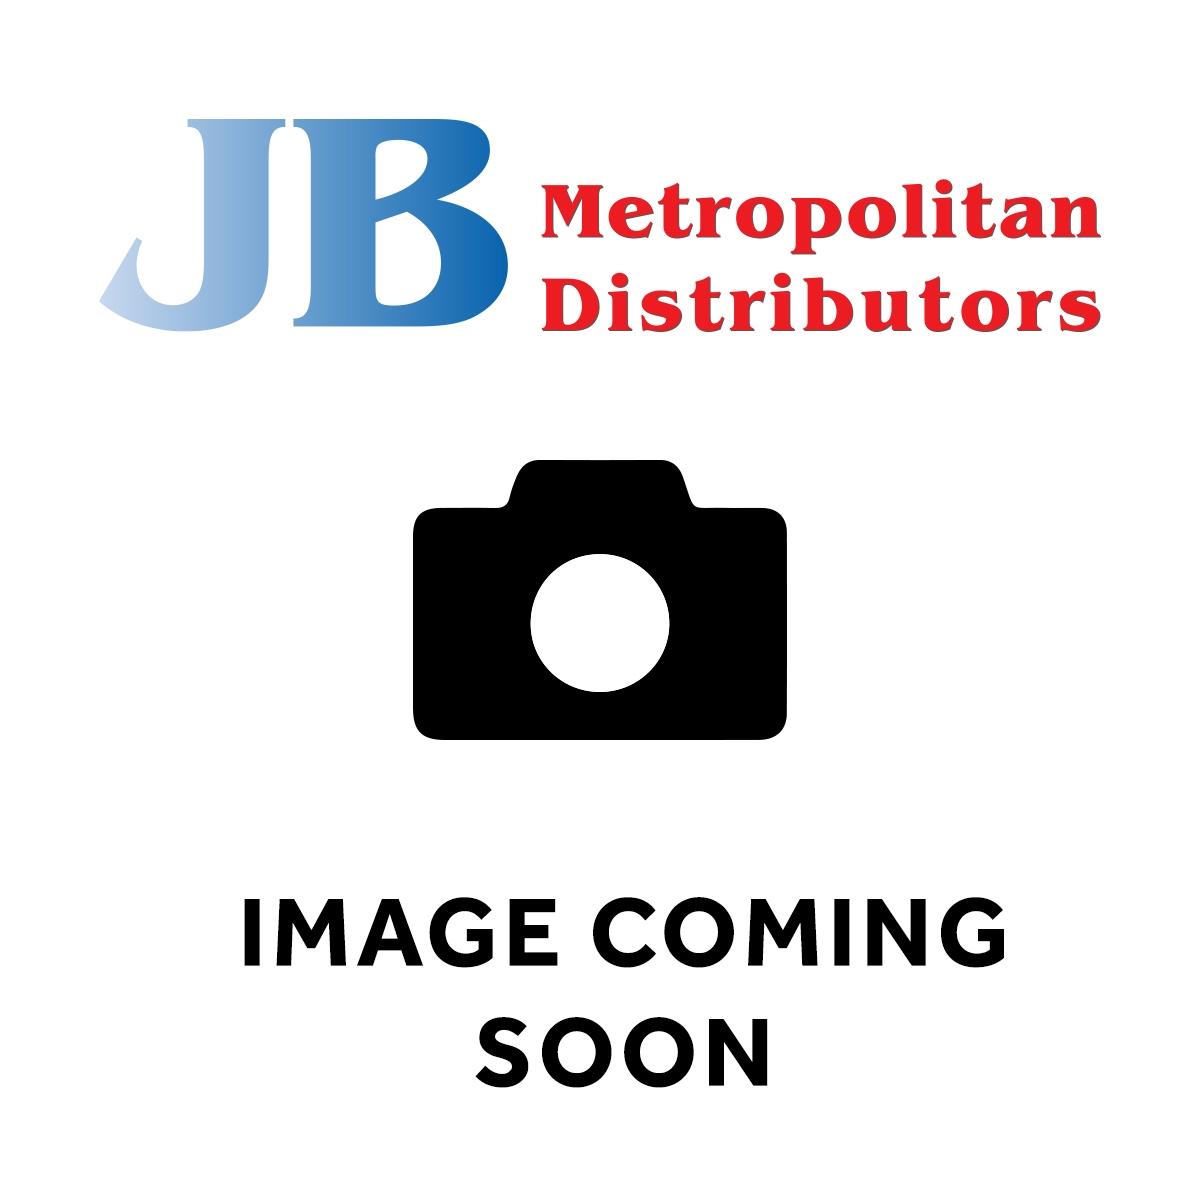 J & J BABY POWDER ALOE VERA + VITAMIN E CORNSTARCH 255G